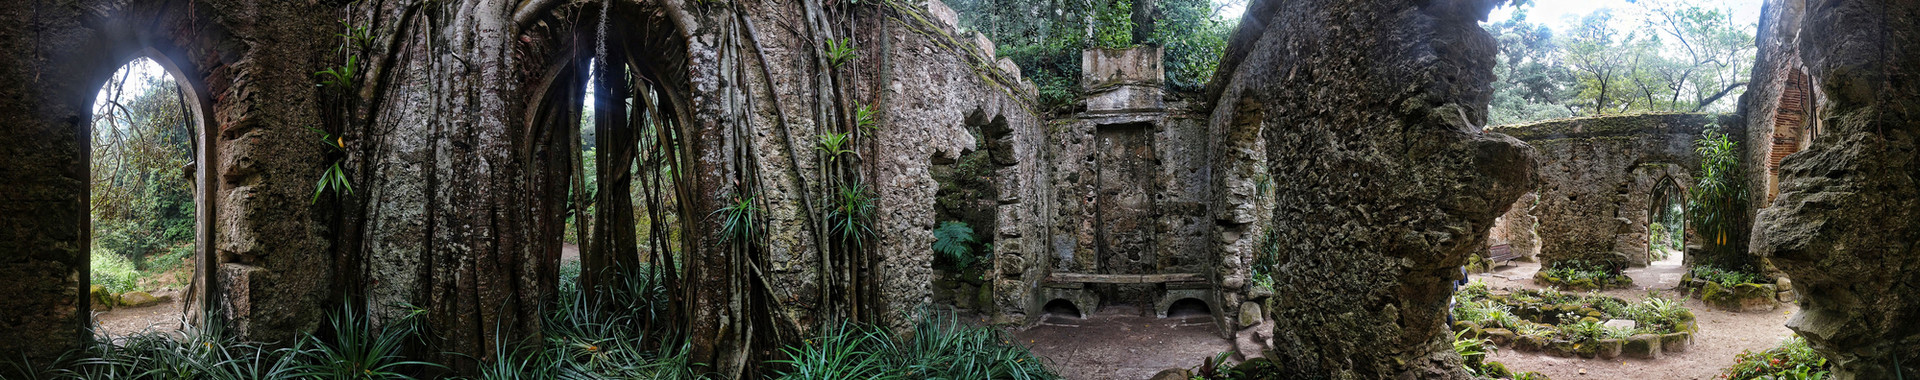 2017 Sintra Parque de Monserrate V pano